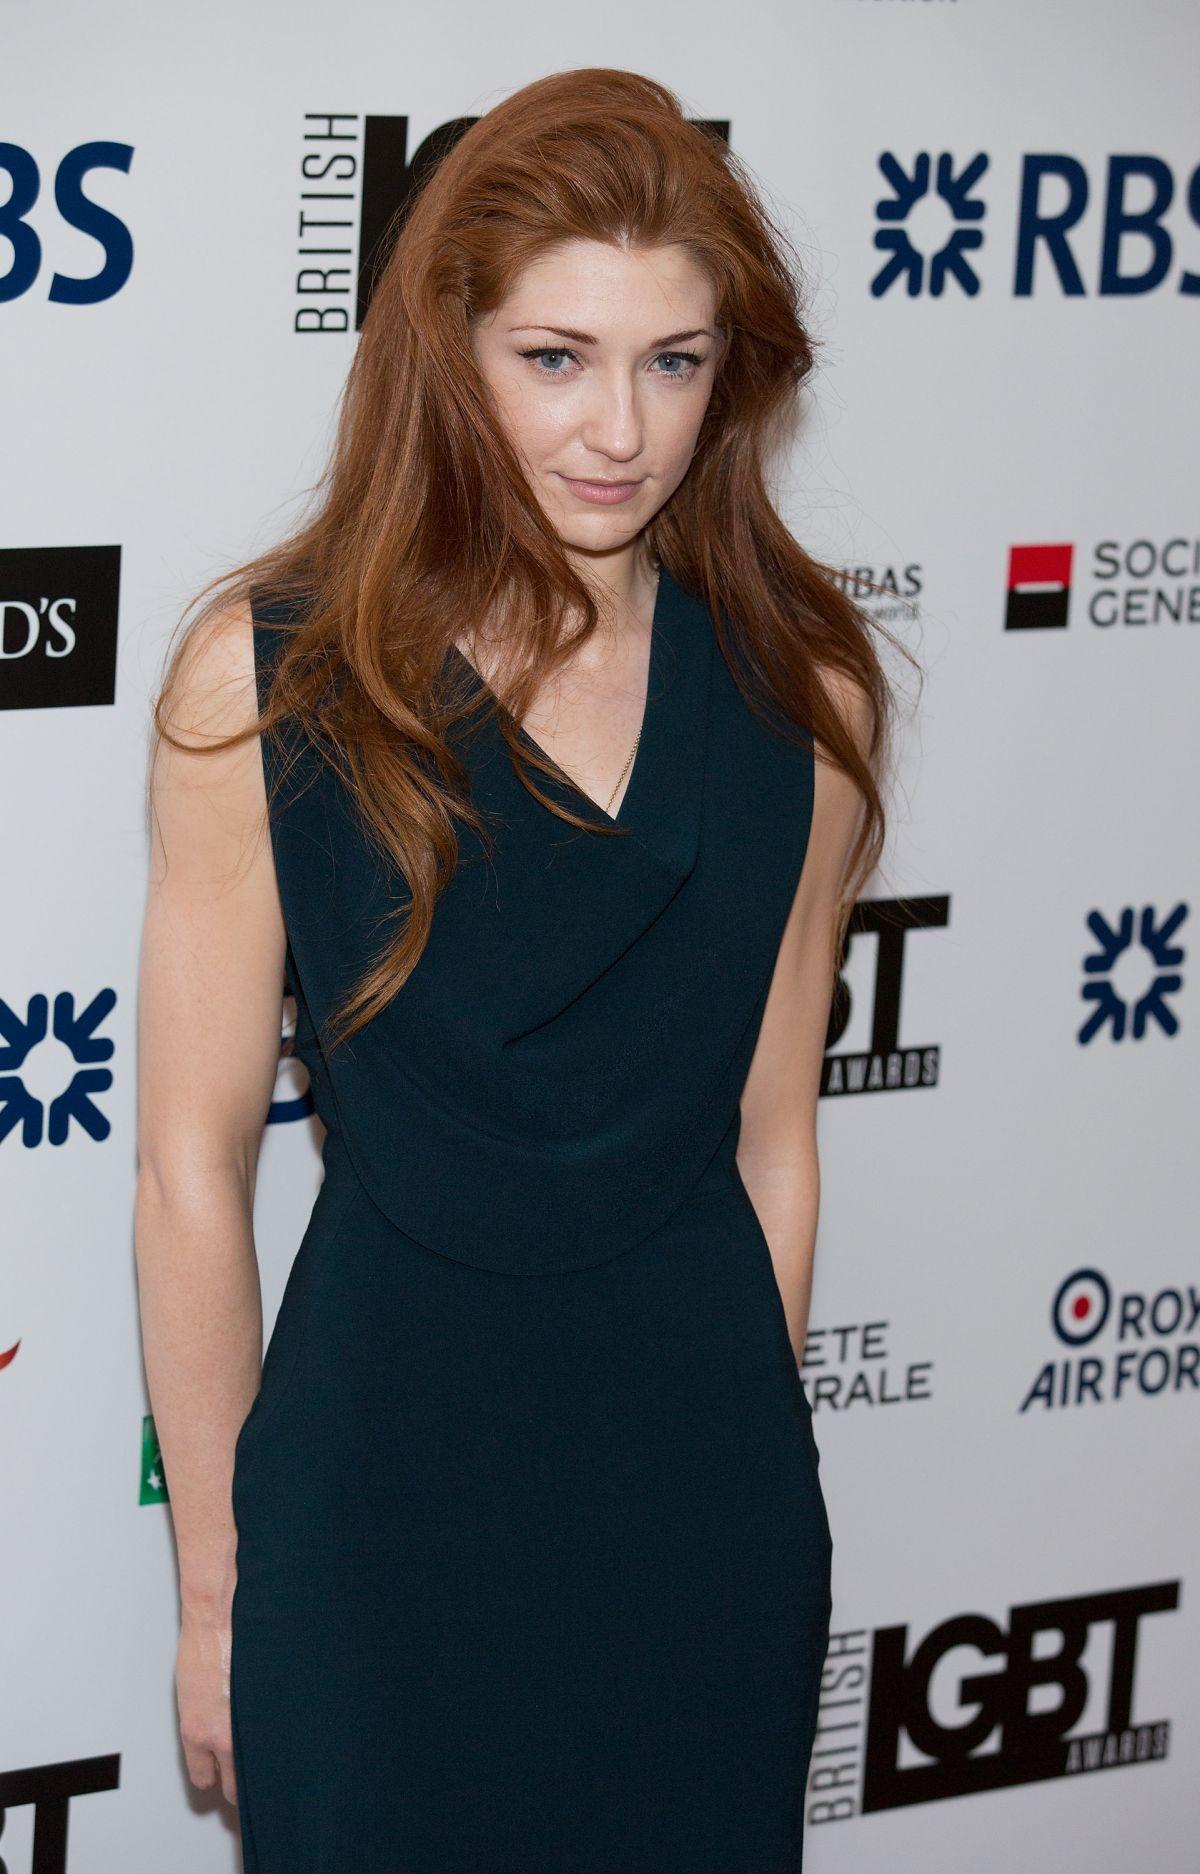 NICOLE ROBERTS at LGBT Awards 2015 in London